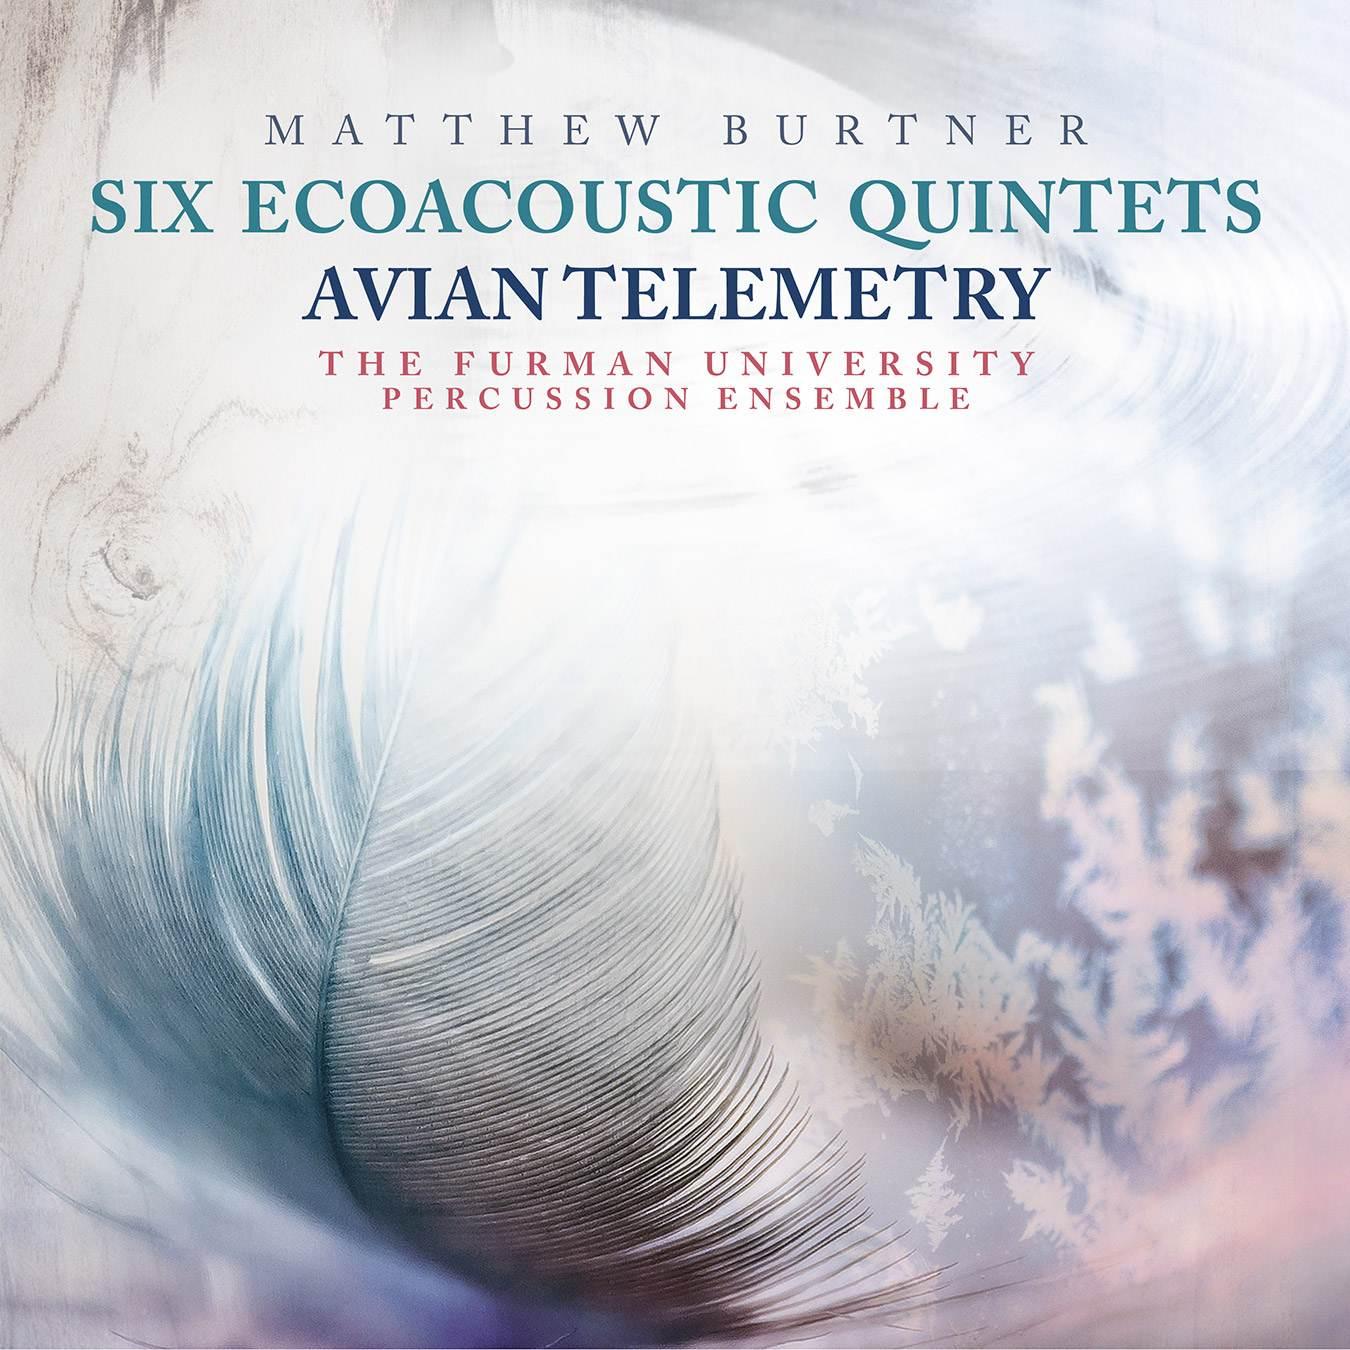 Six Ecoacoustic Quintets/Avian Telemetry - Matthew Burtner - Album Cover